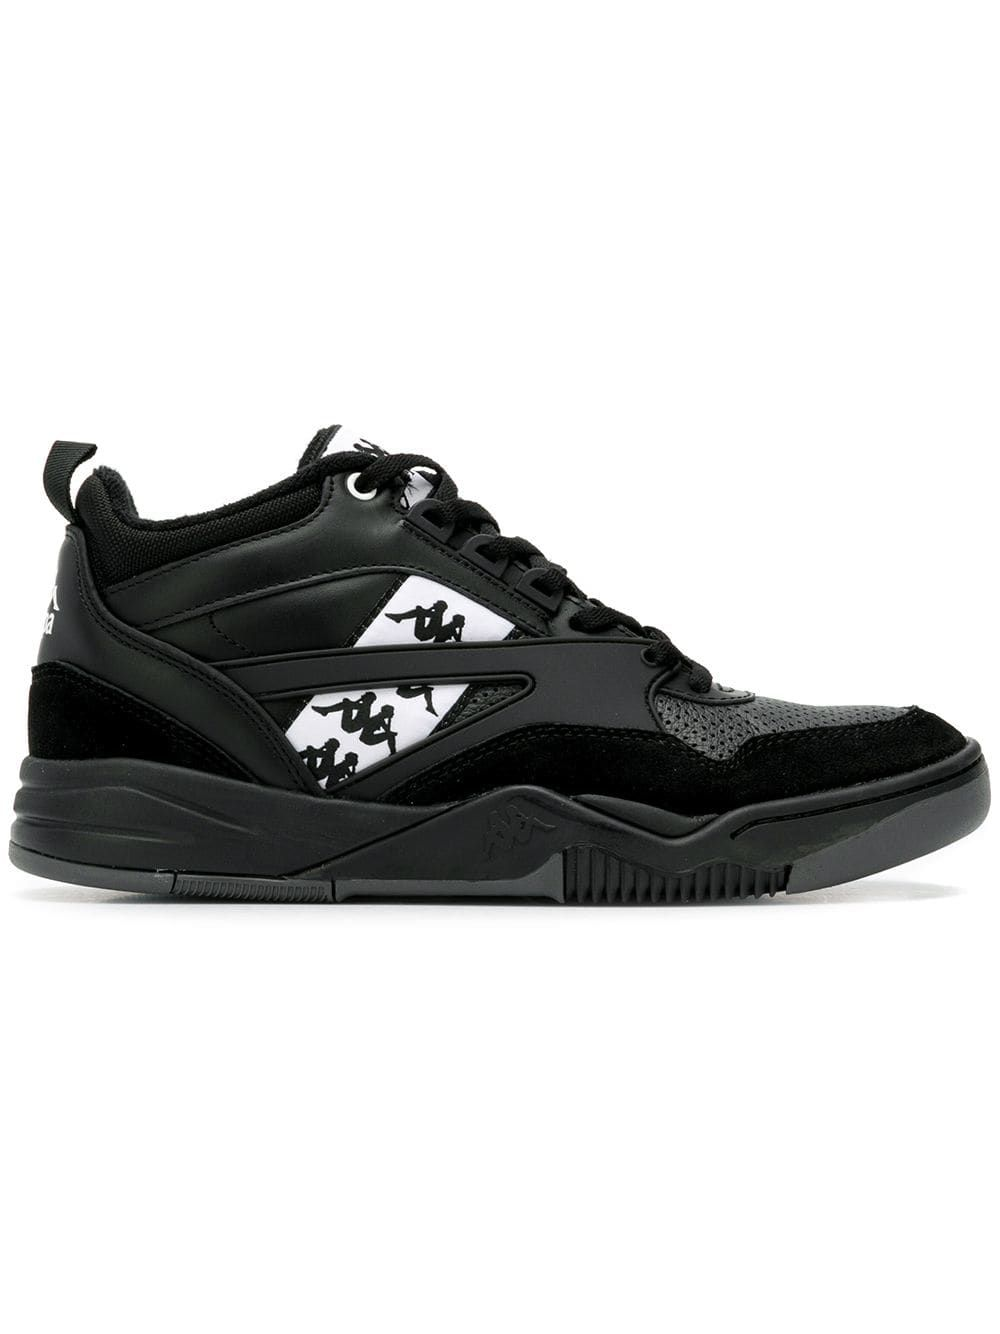 e21fd953389e KAPPA KAPPA HI-TOP SNEAKERS - BLACK. #kappa #shoes | Kappa in 2019 ...